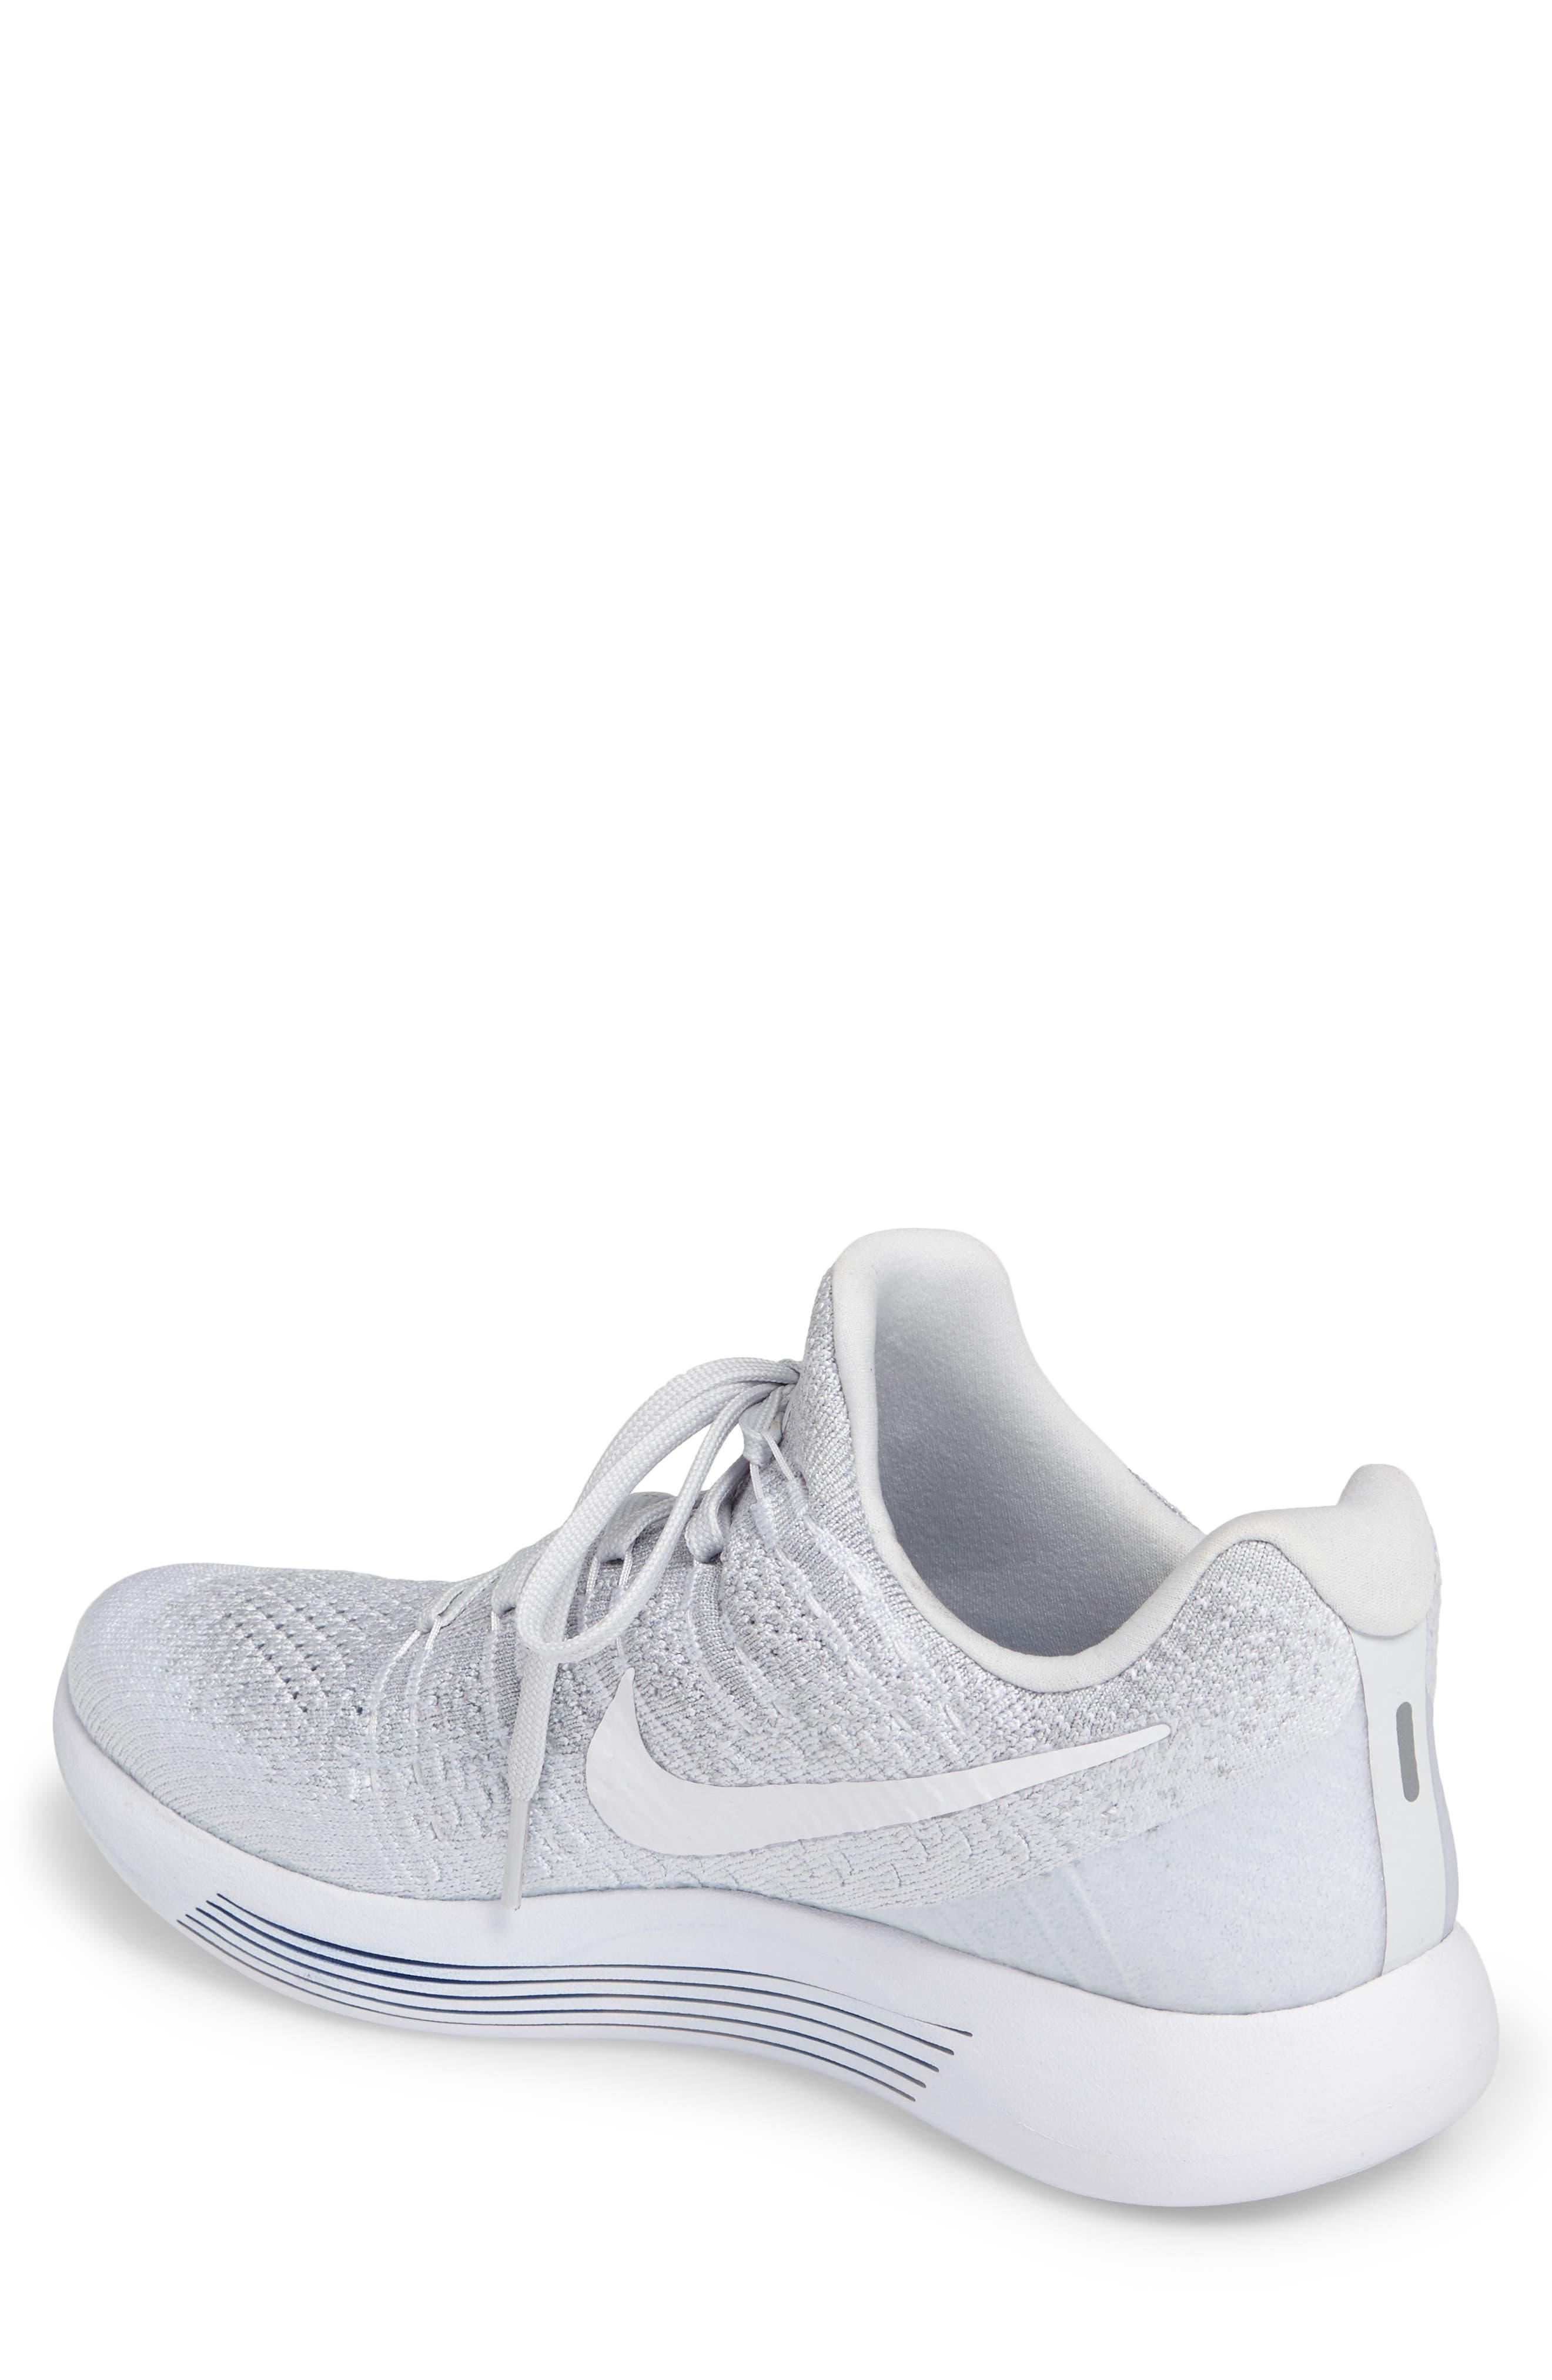 Alternate Image 2  - Nike Flyknit 2 LunarEpic Running Shoe (Men)